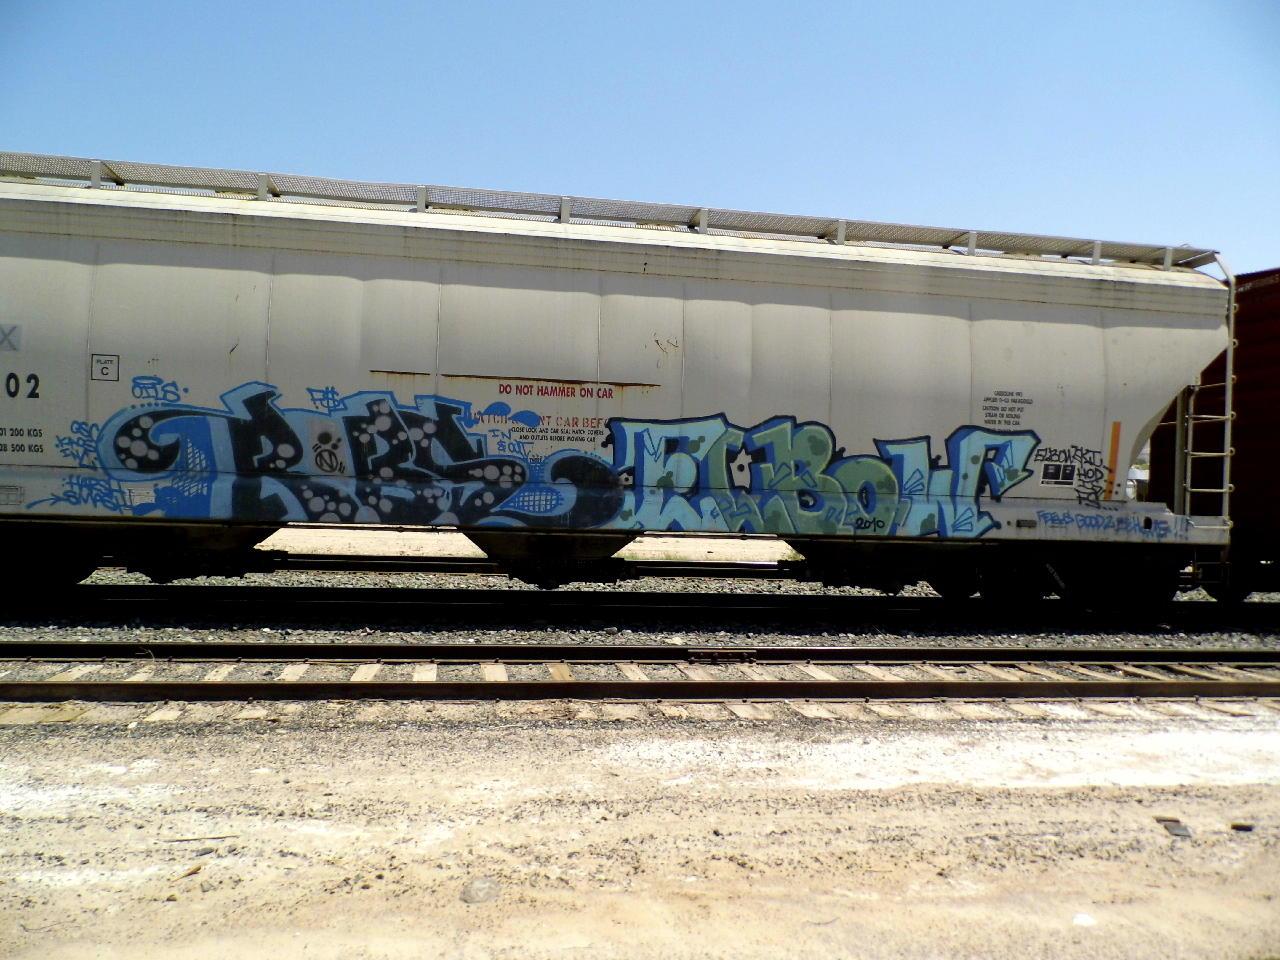 Art Crimes: Trains 349